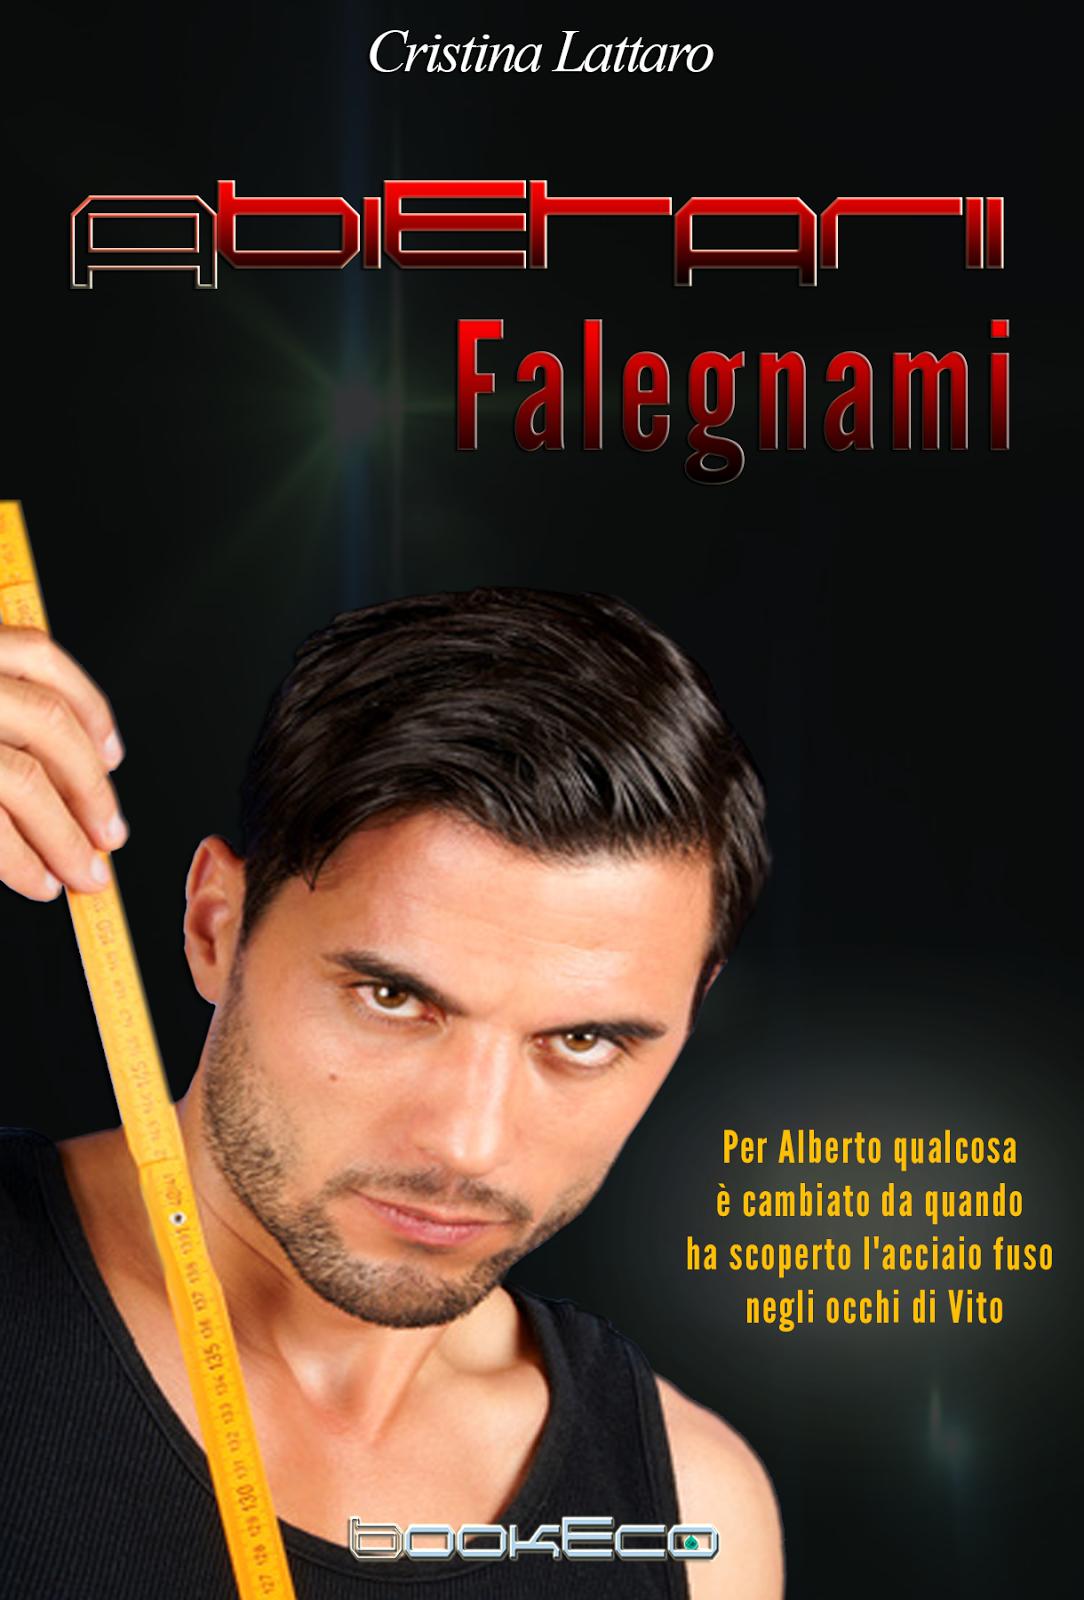 Titolo Abietarii Falegnami Autore Cristina Lattaro Pag 235 Narrativa Italiana LGBT ISBN 9788899561055 Ebook 149 Euro